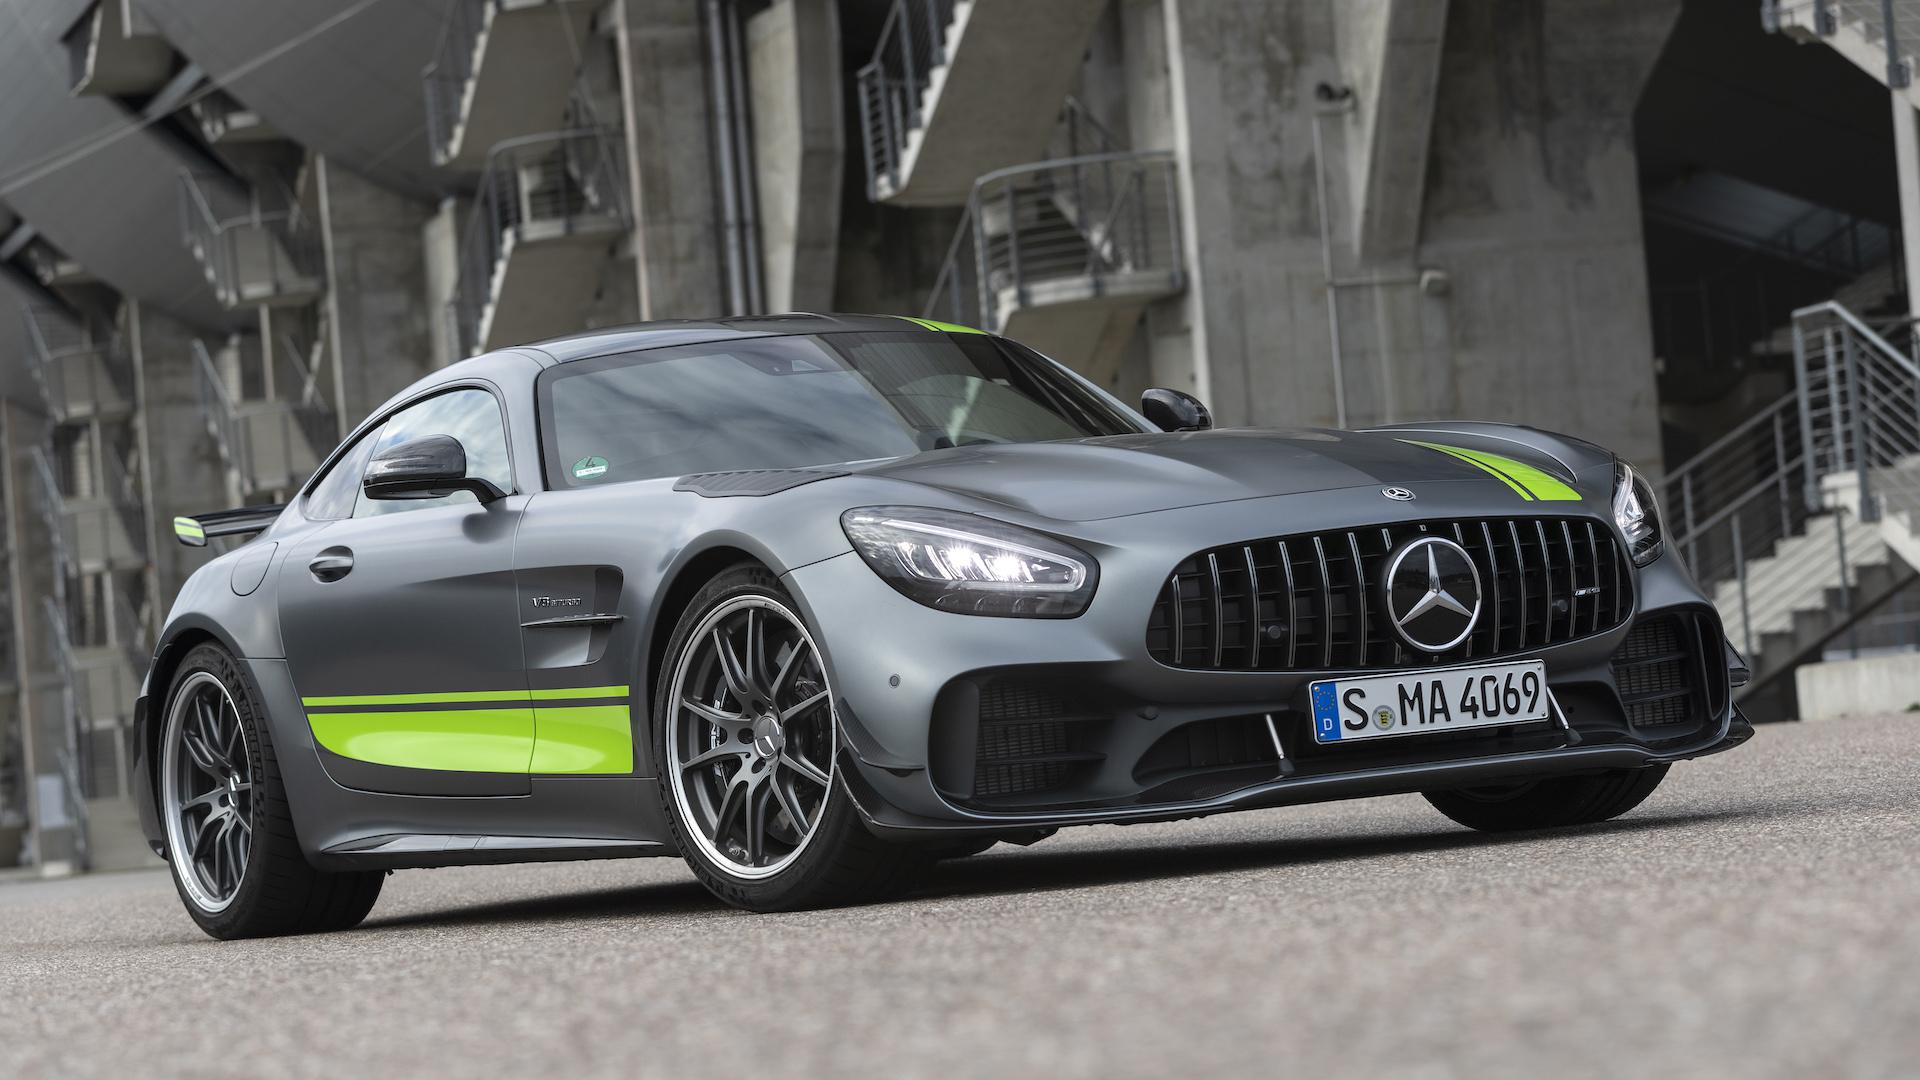 2019 Mercedes Amg Gt R Pro Review Gtspirit